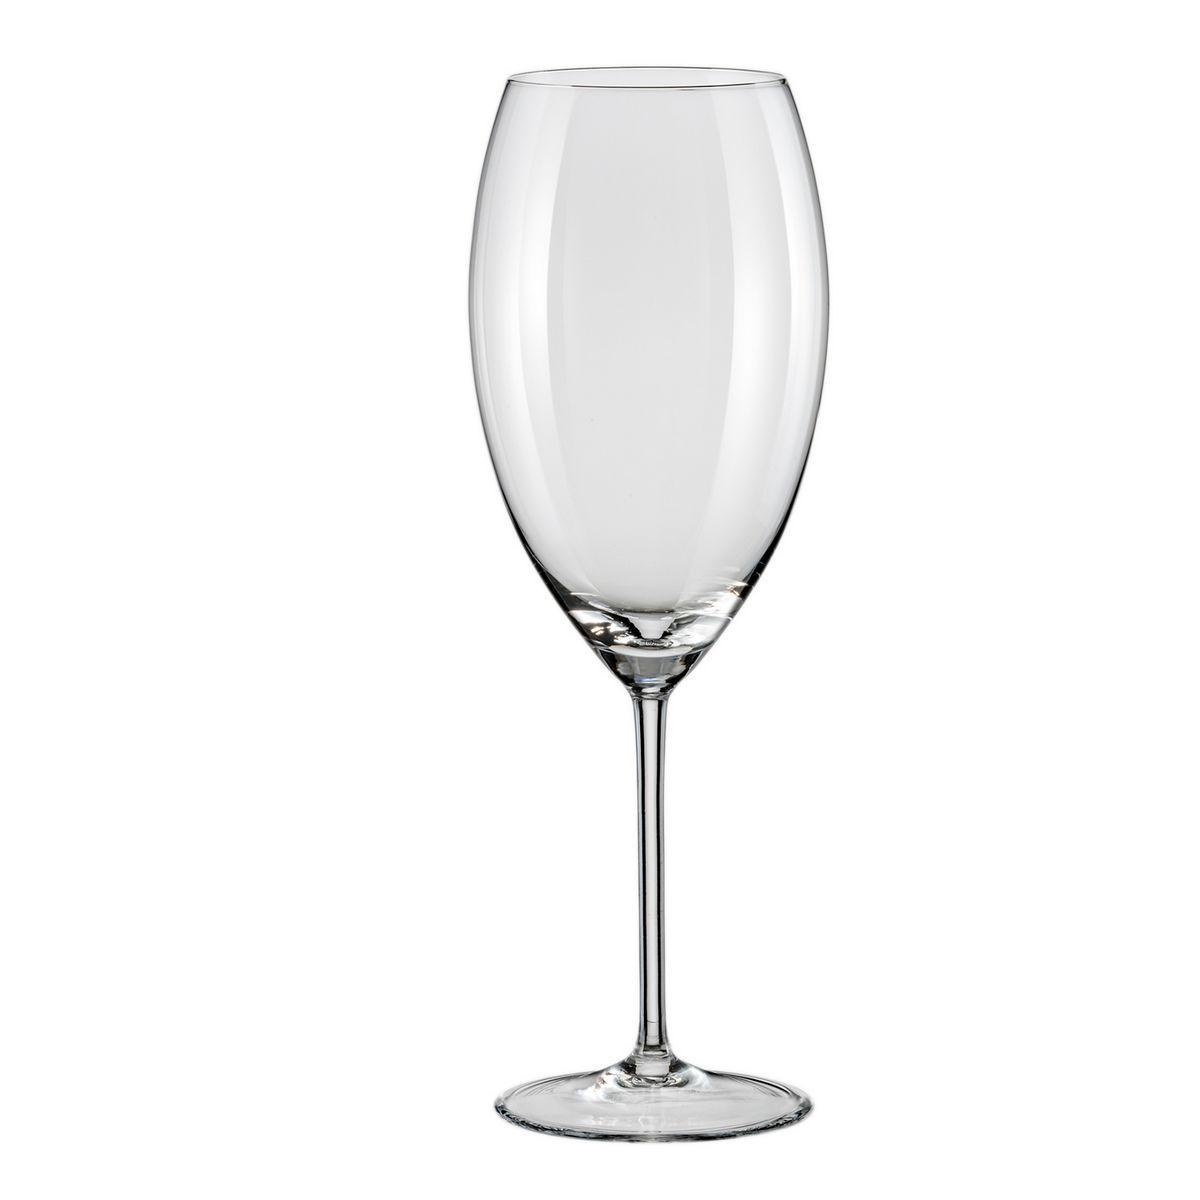 GRANDIOSO Set 2 pahare cristalin vin 600 ml